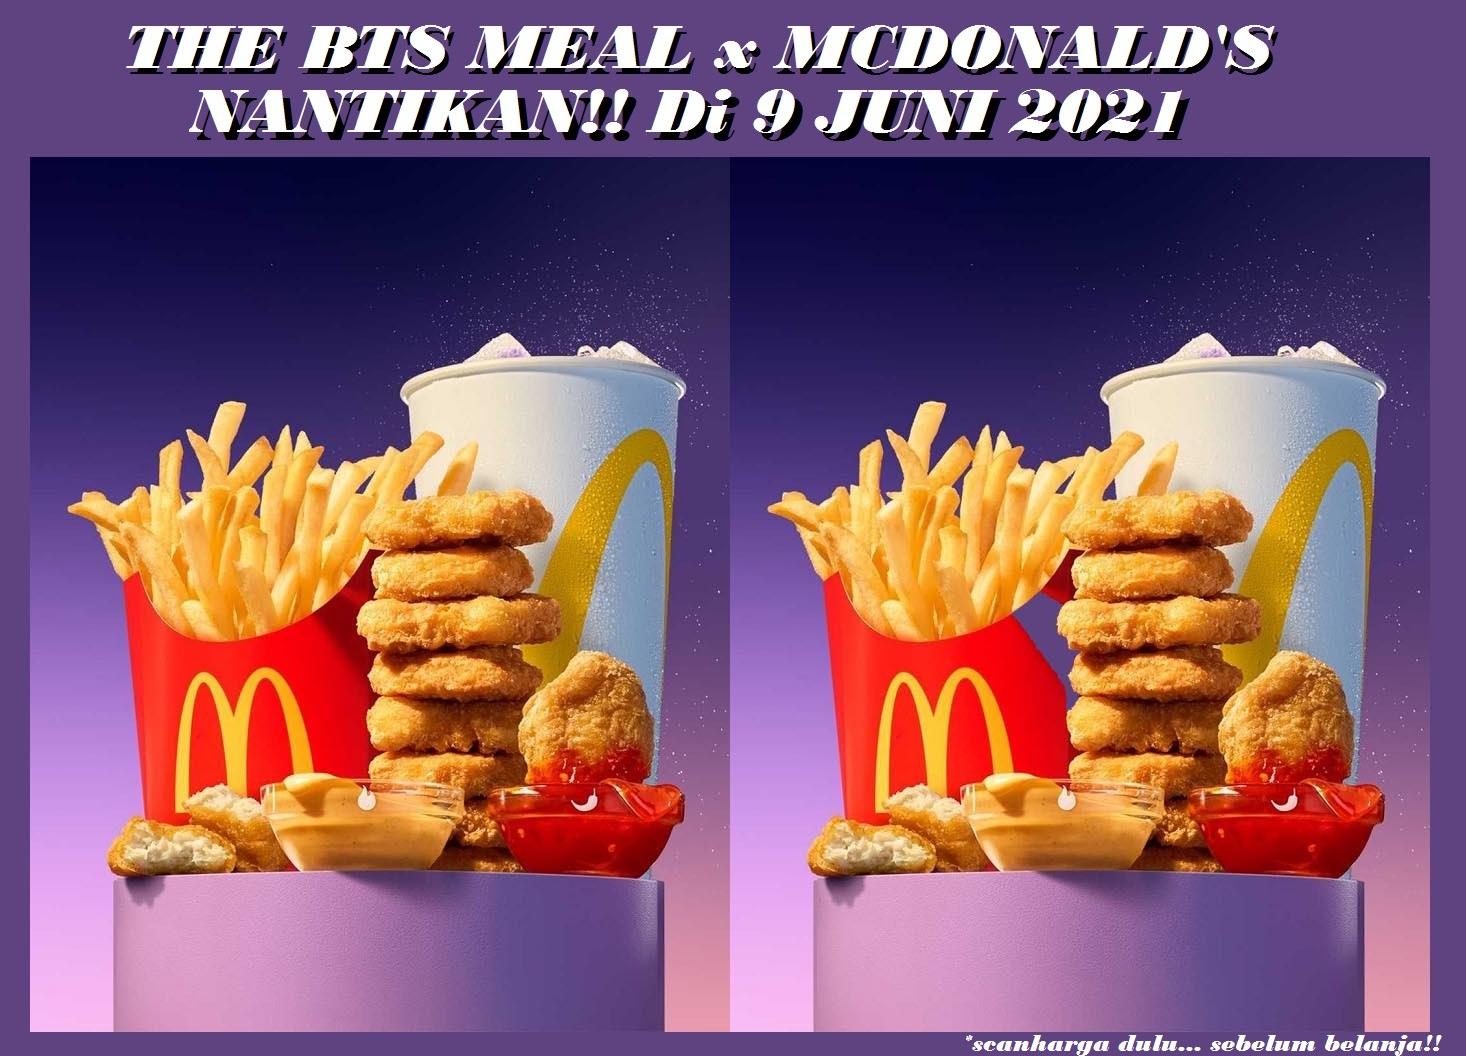 The BTS Meal McDonalds - Harga Special Set Menu Periode Juni 2021